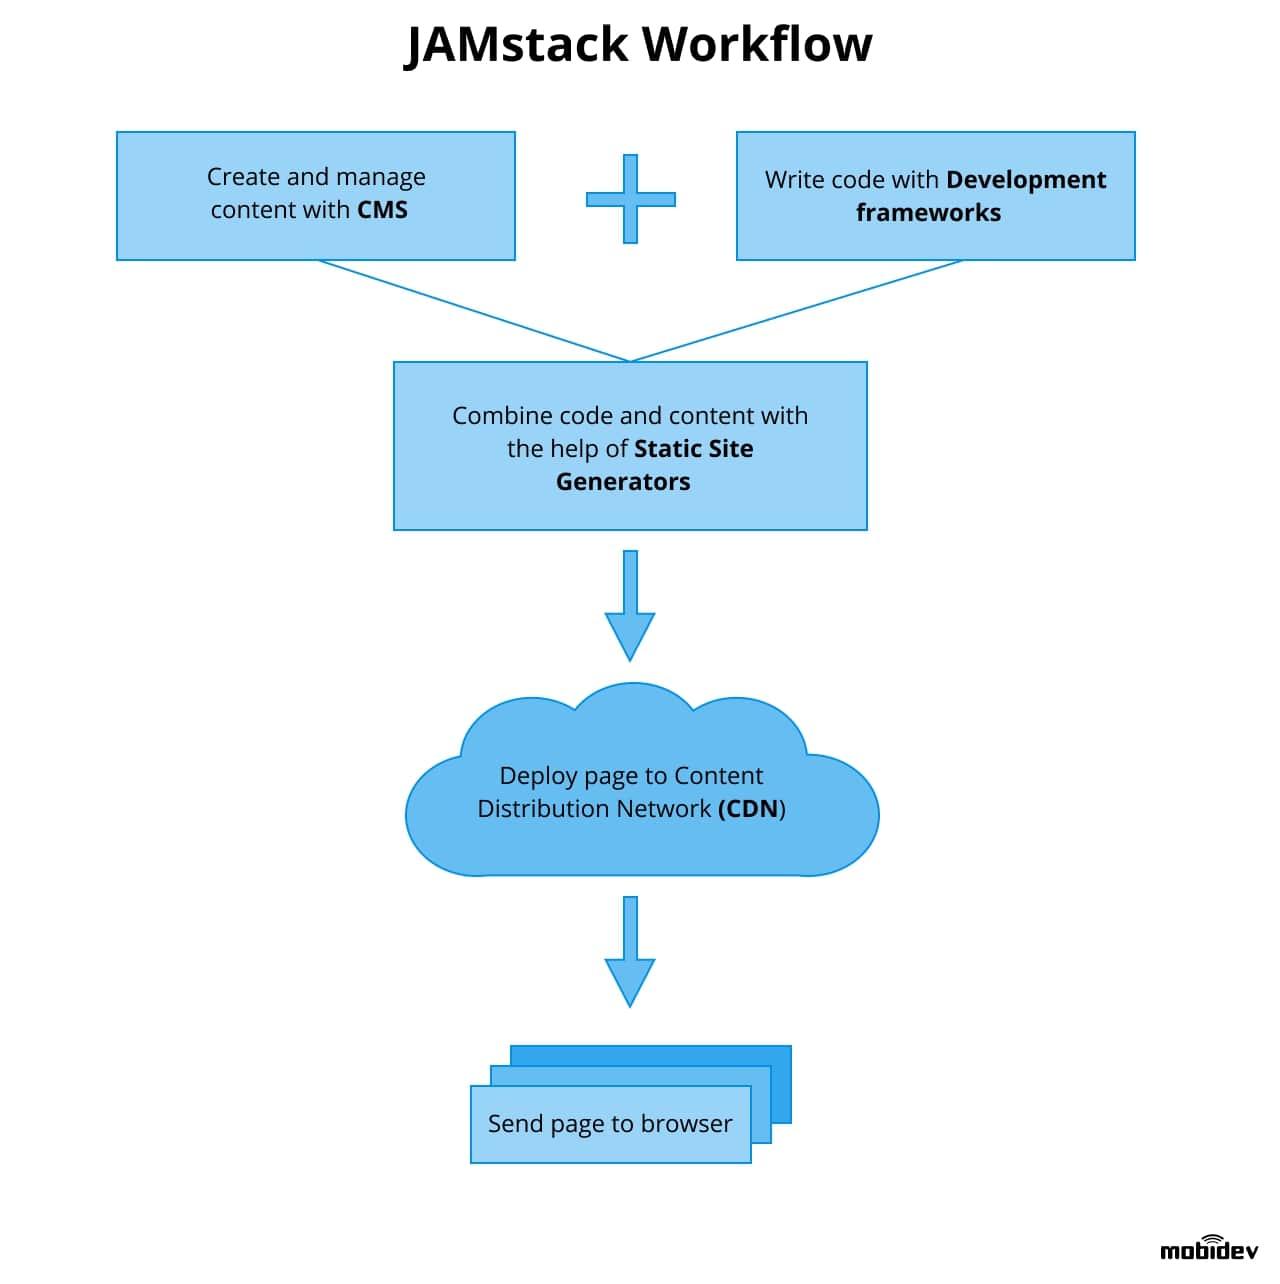 How JAMstack works